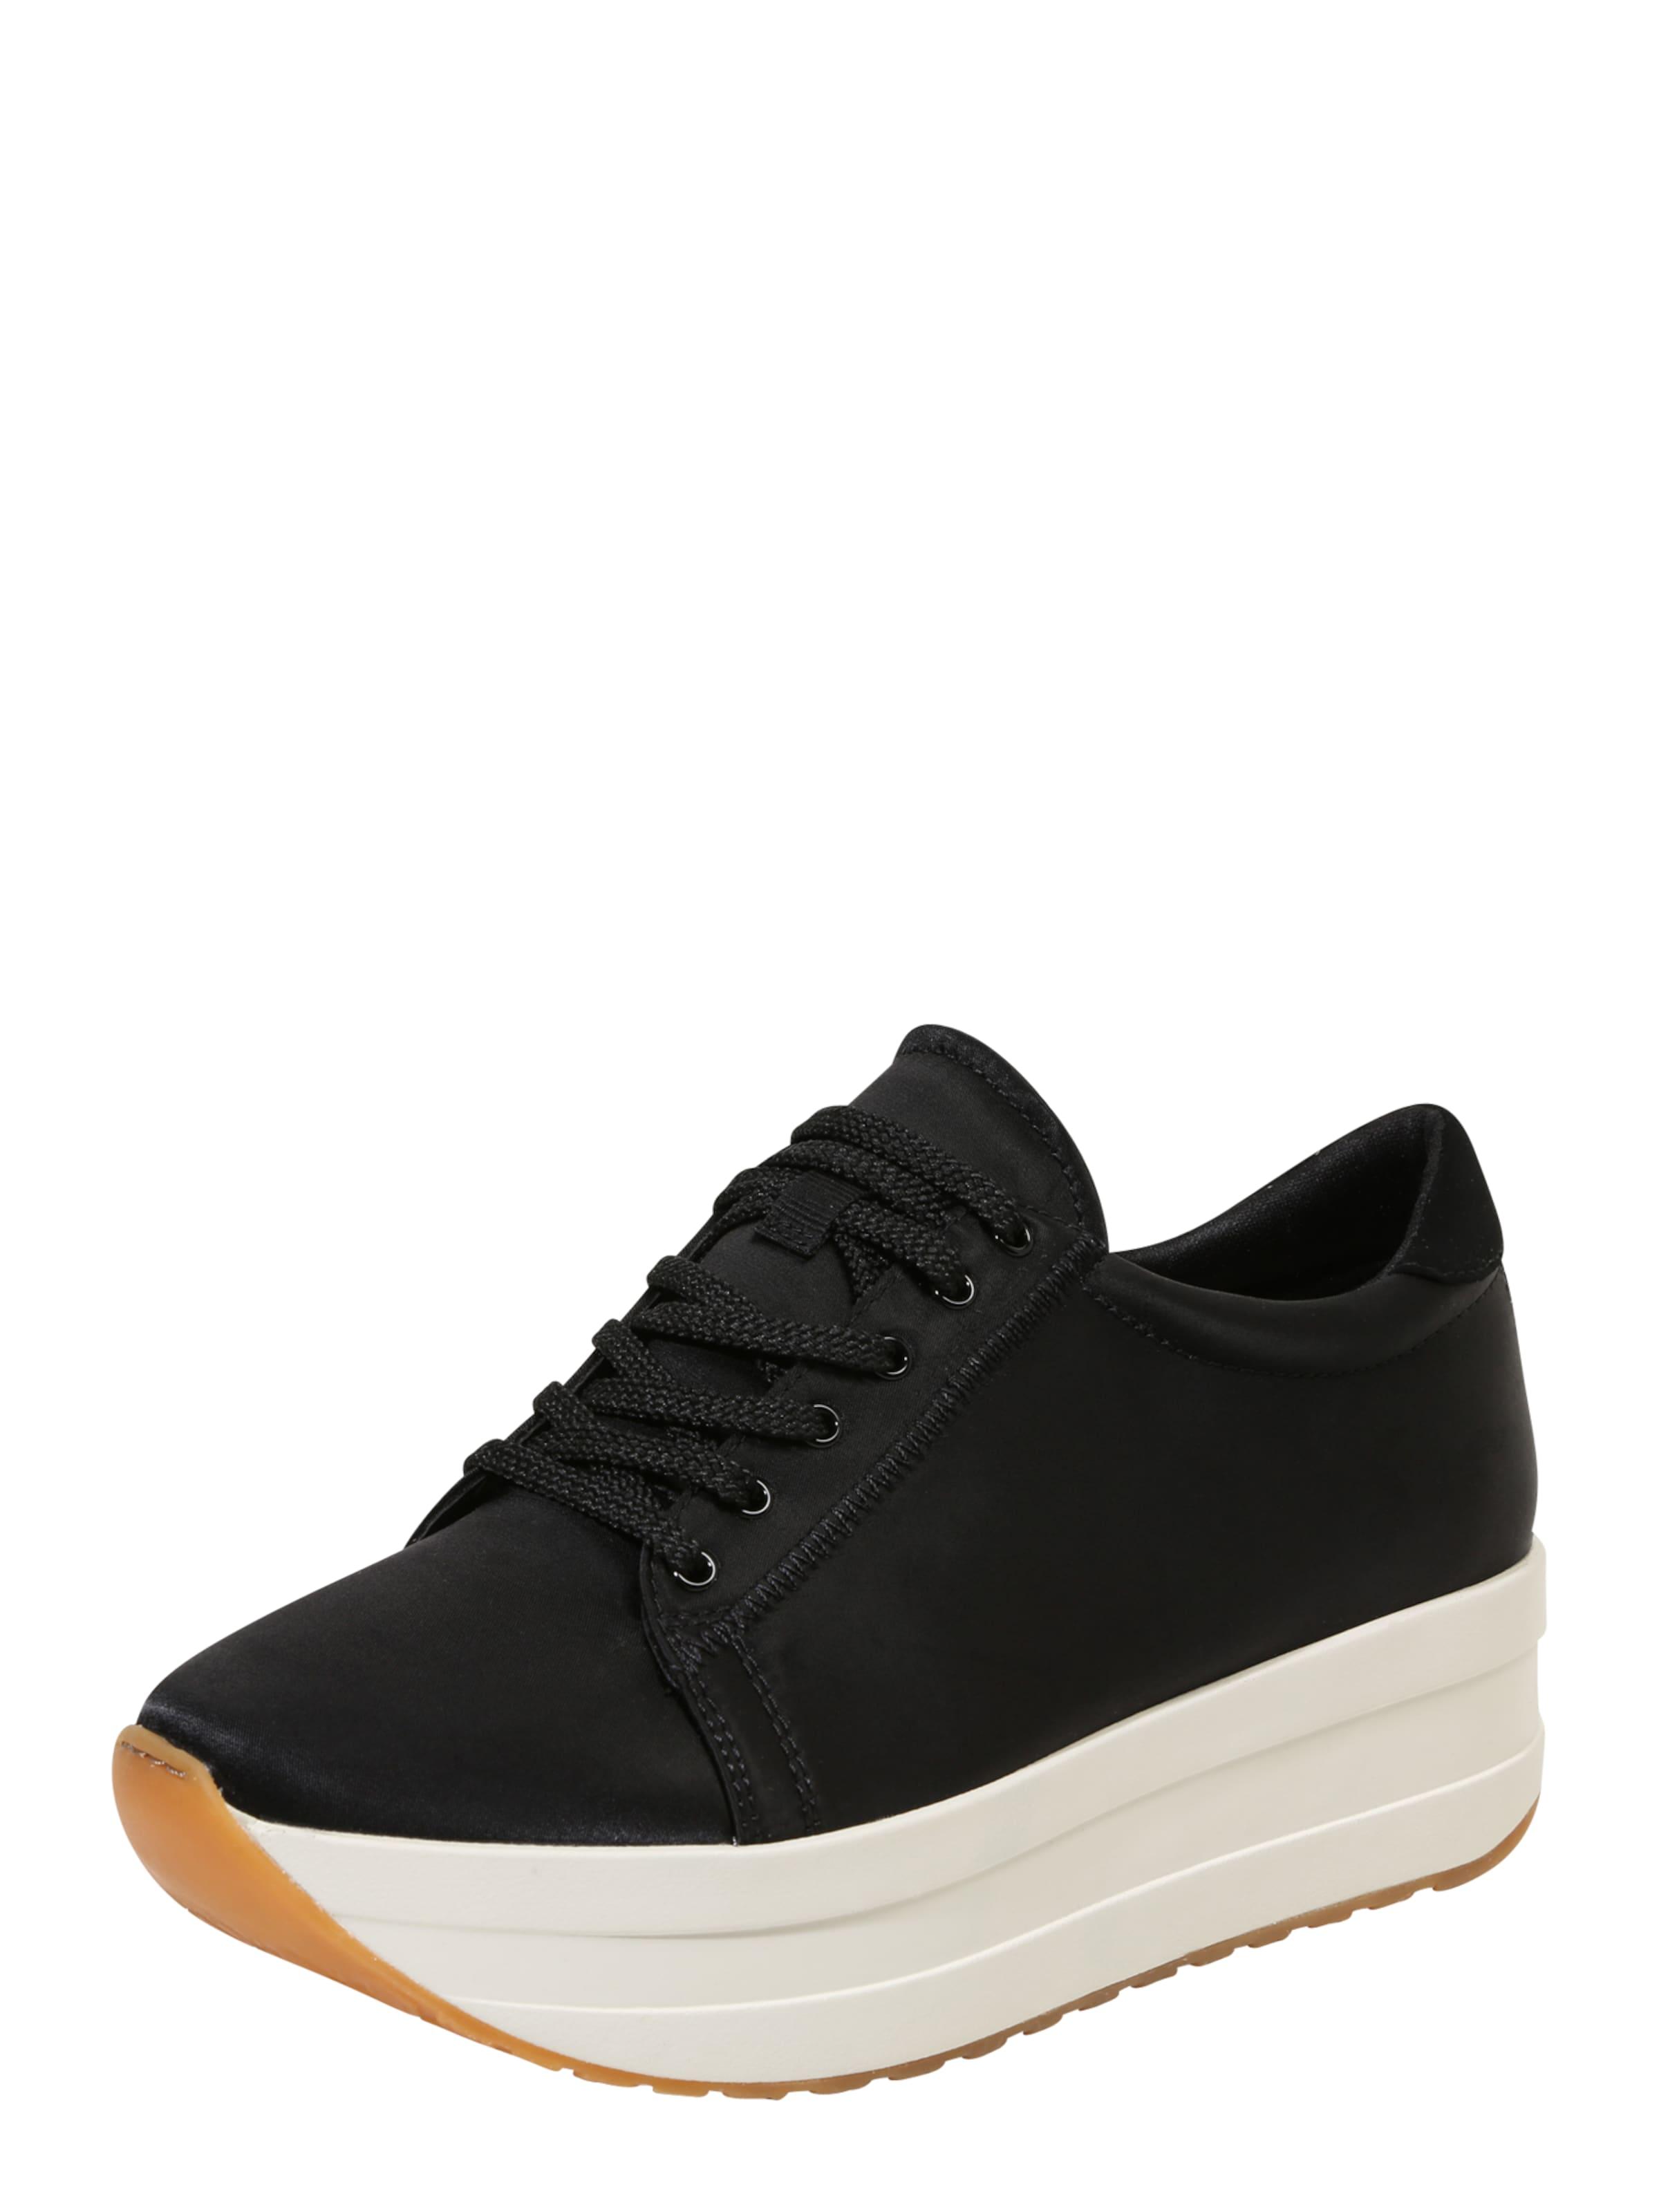 VAGABOND SHOEMAKERS Sneaker Casey Verschleißfeste billige Schuhe